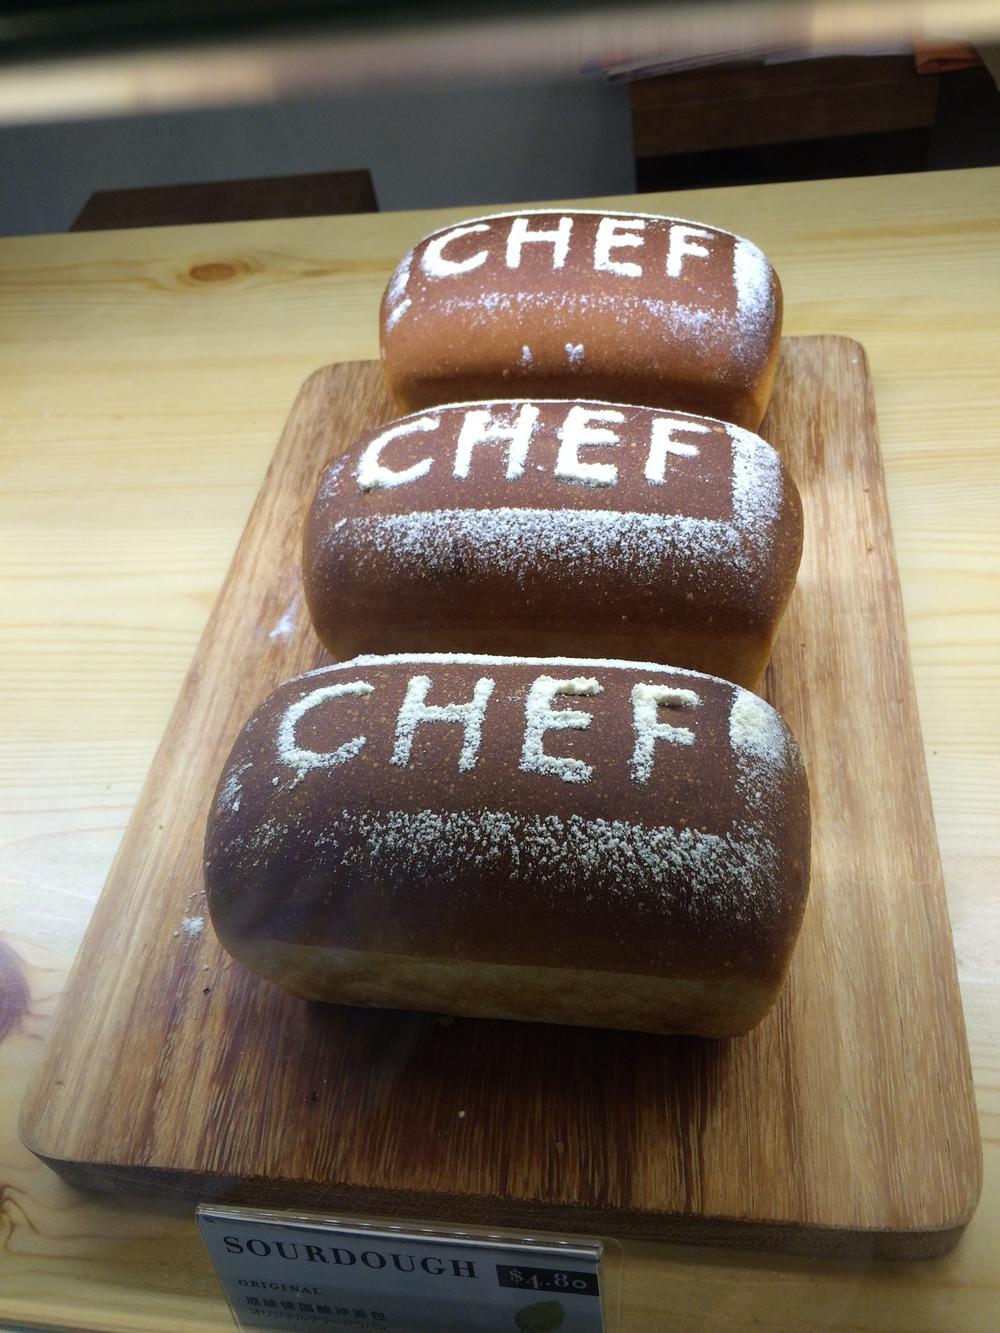 Chef homemade sourdough bread